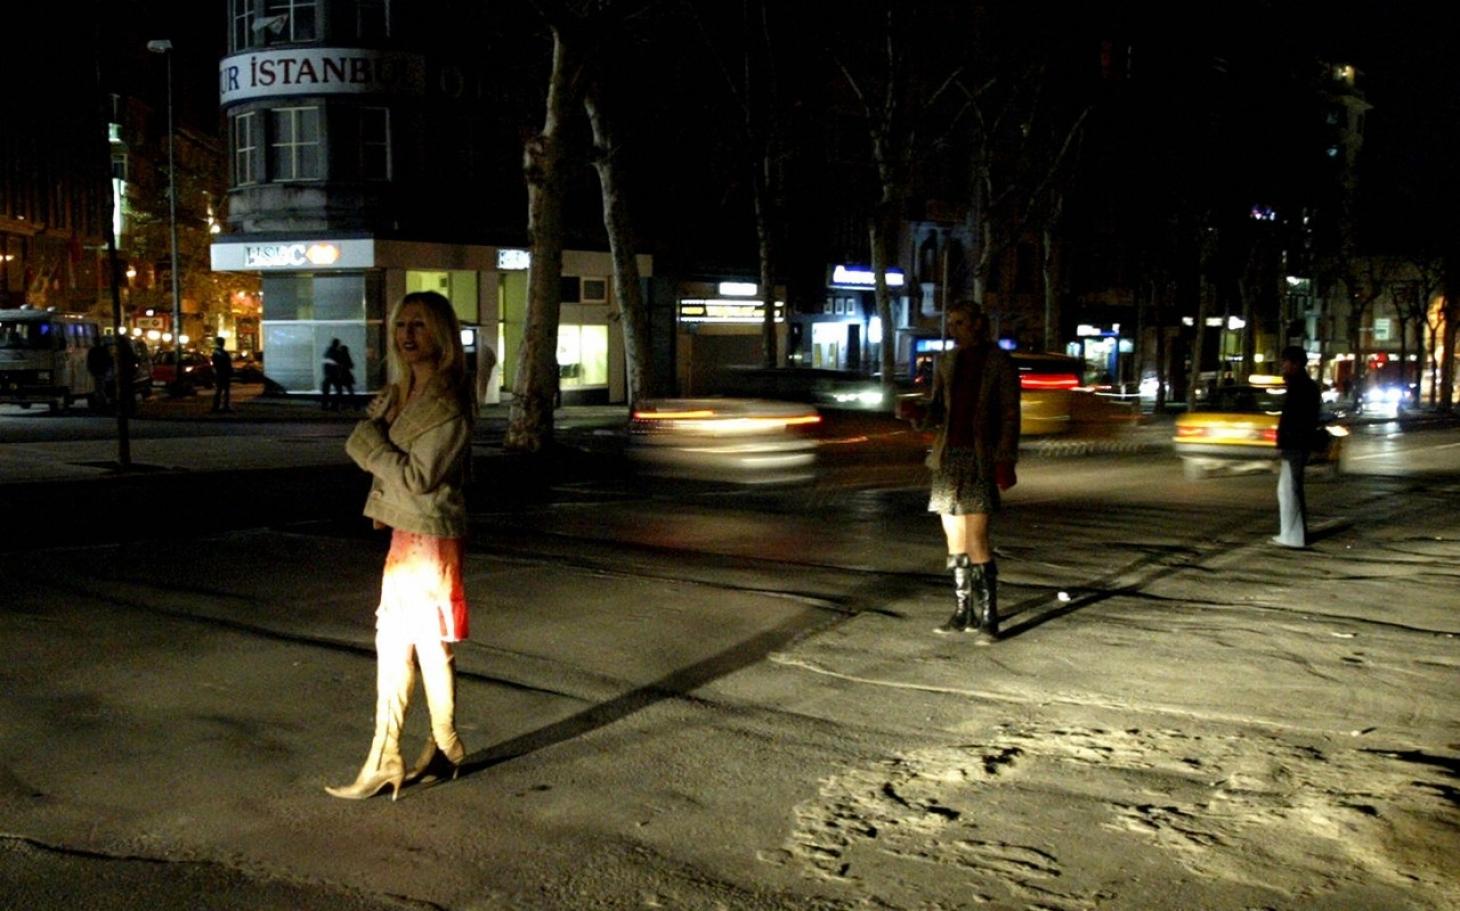 prostitutas alemania prostituyen